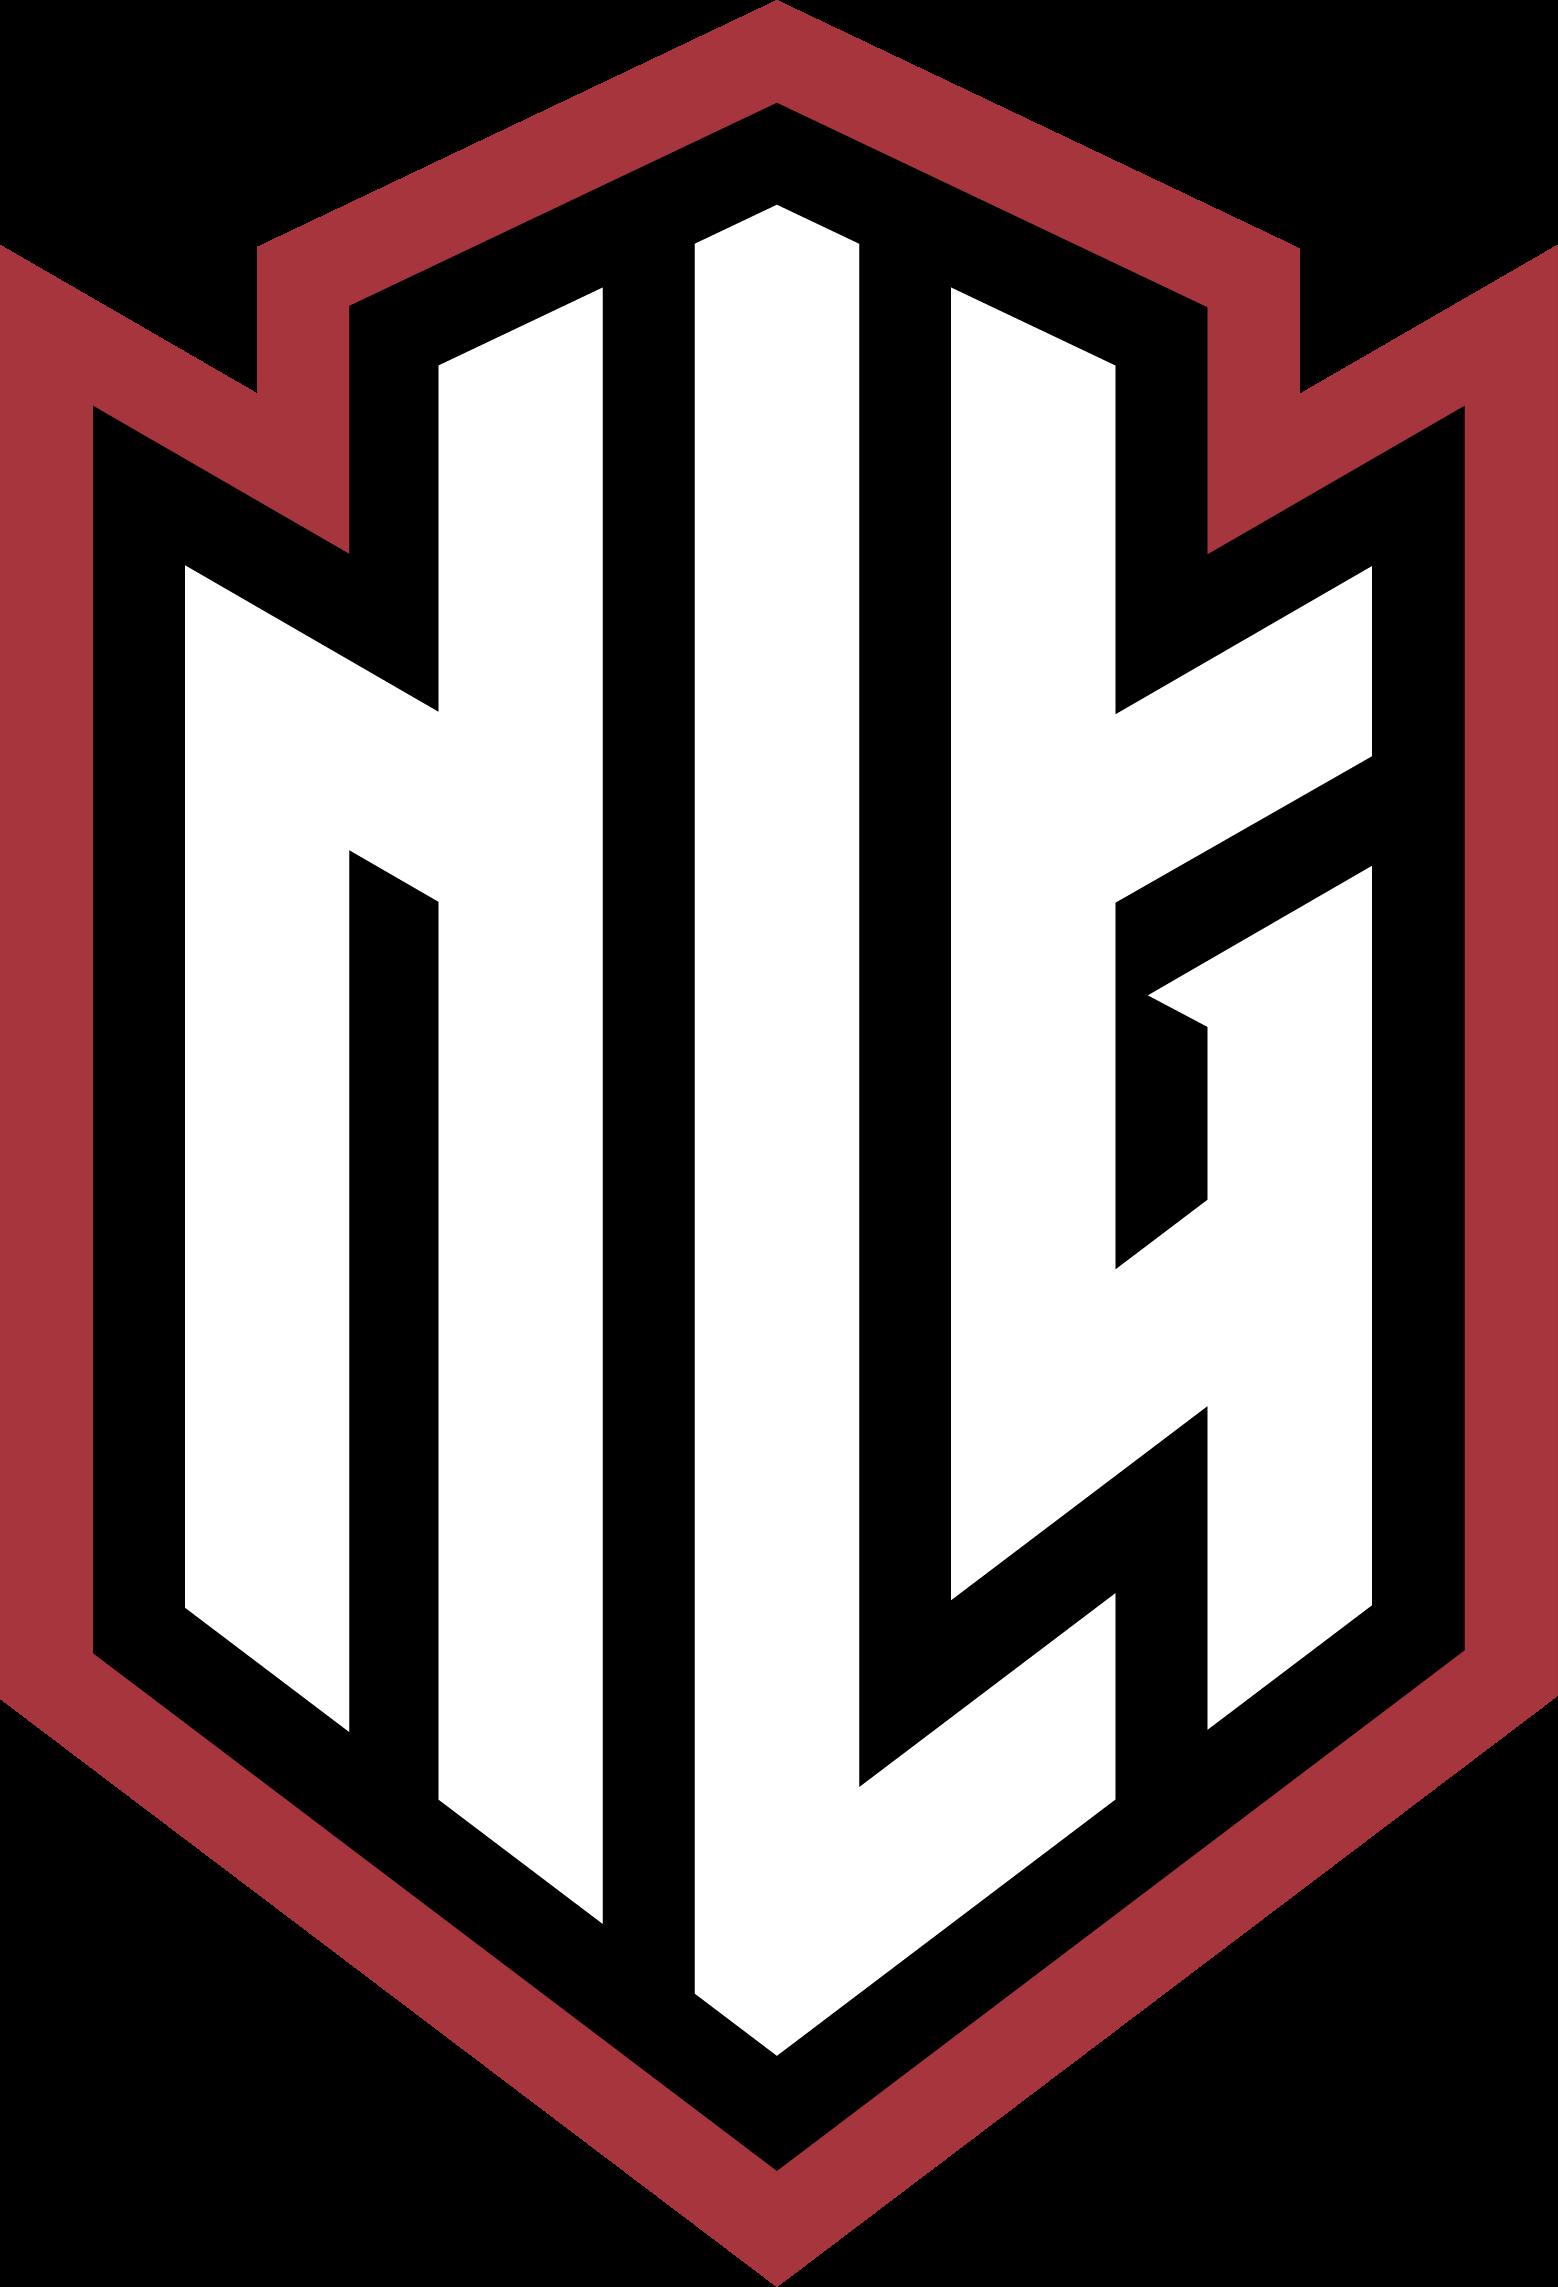 nlgesports logo